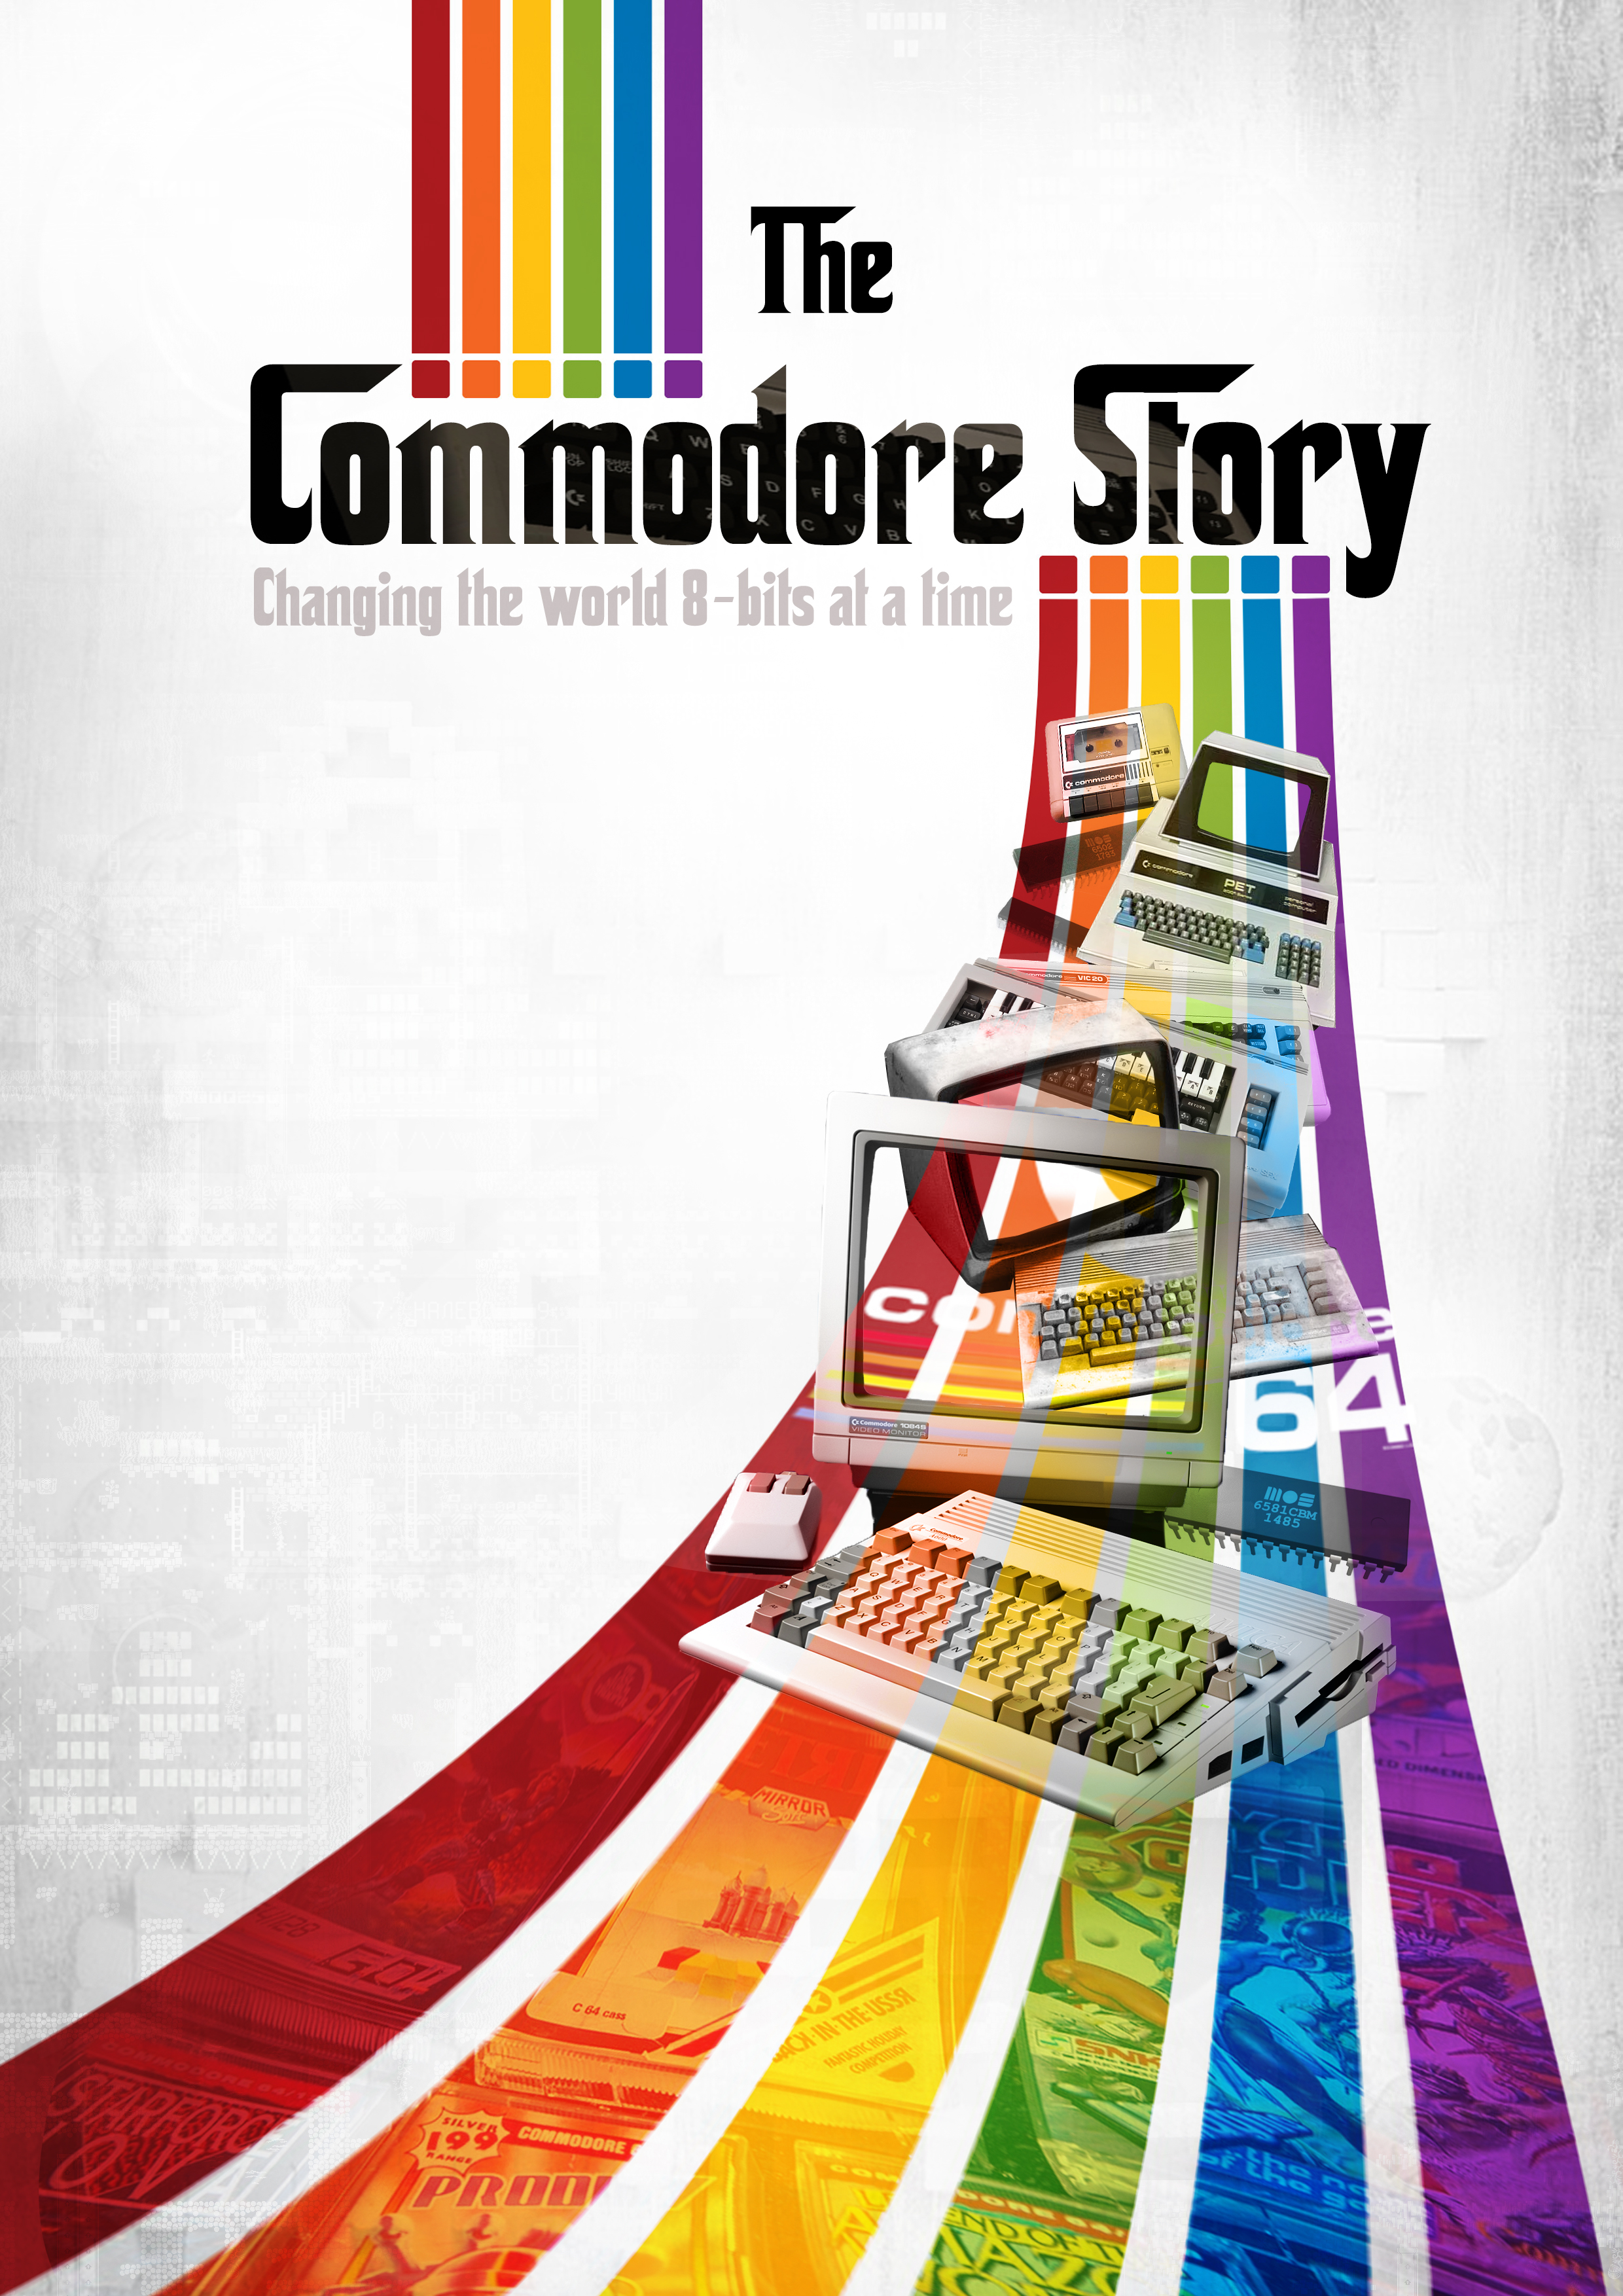 The Commodore Story (2018) - IMDb